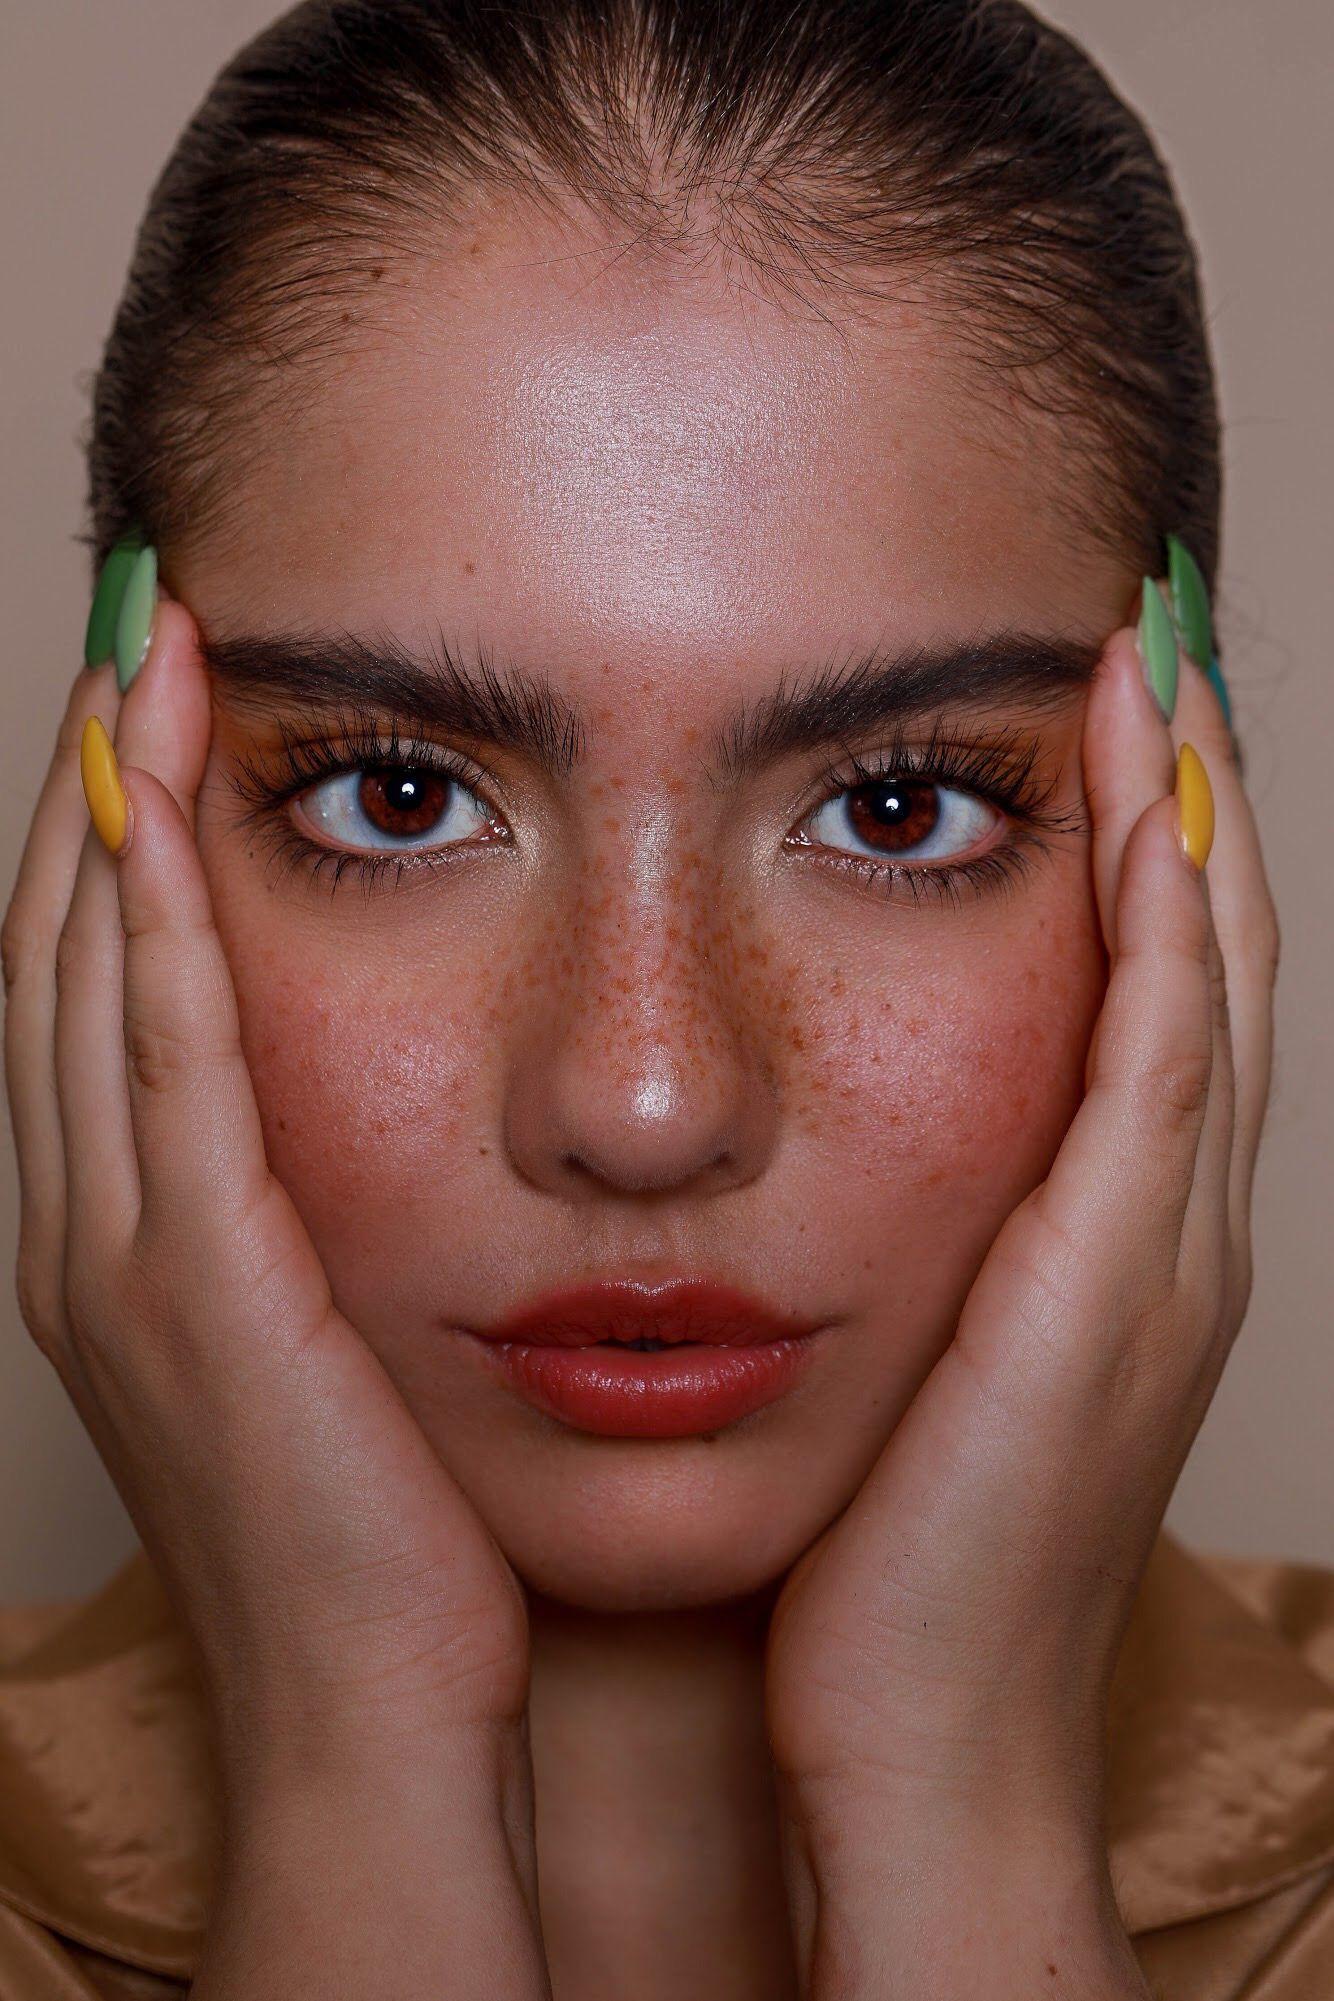 Freckles natural face makeup no makeup look long lashes